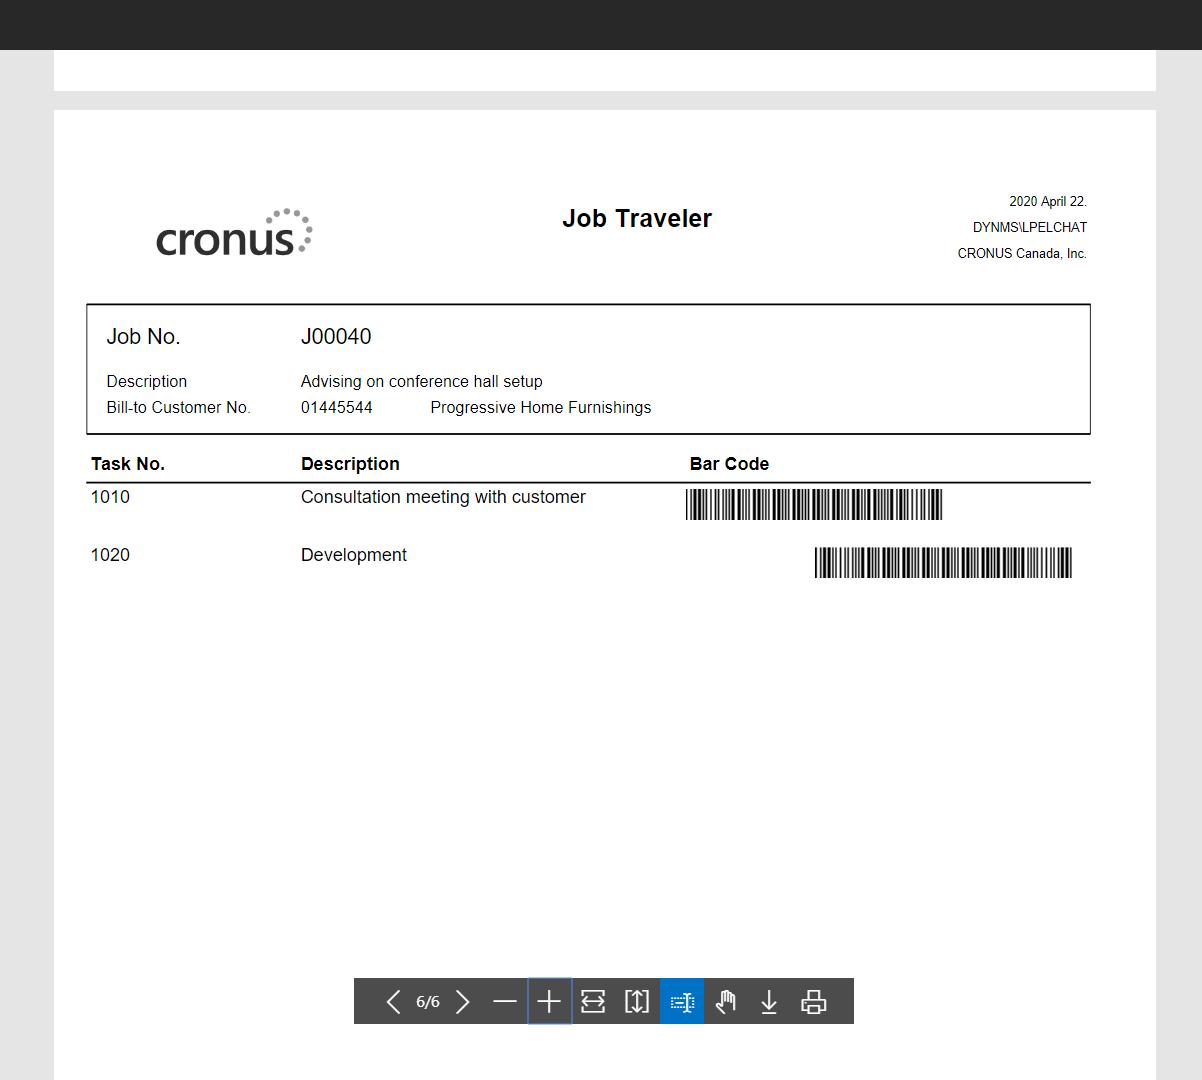 Print Job Traveler